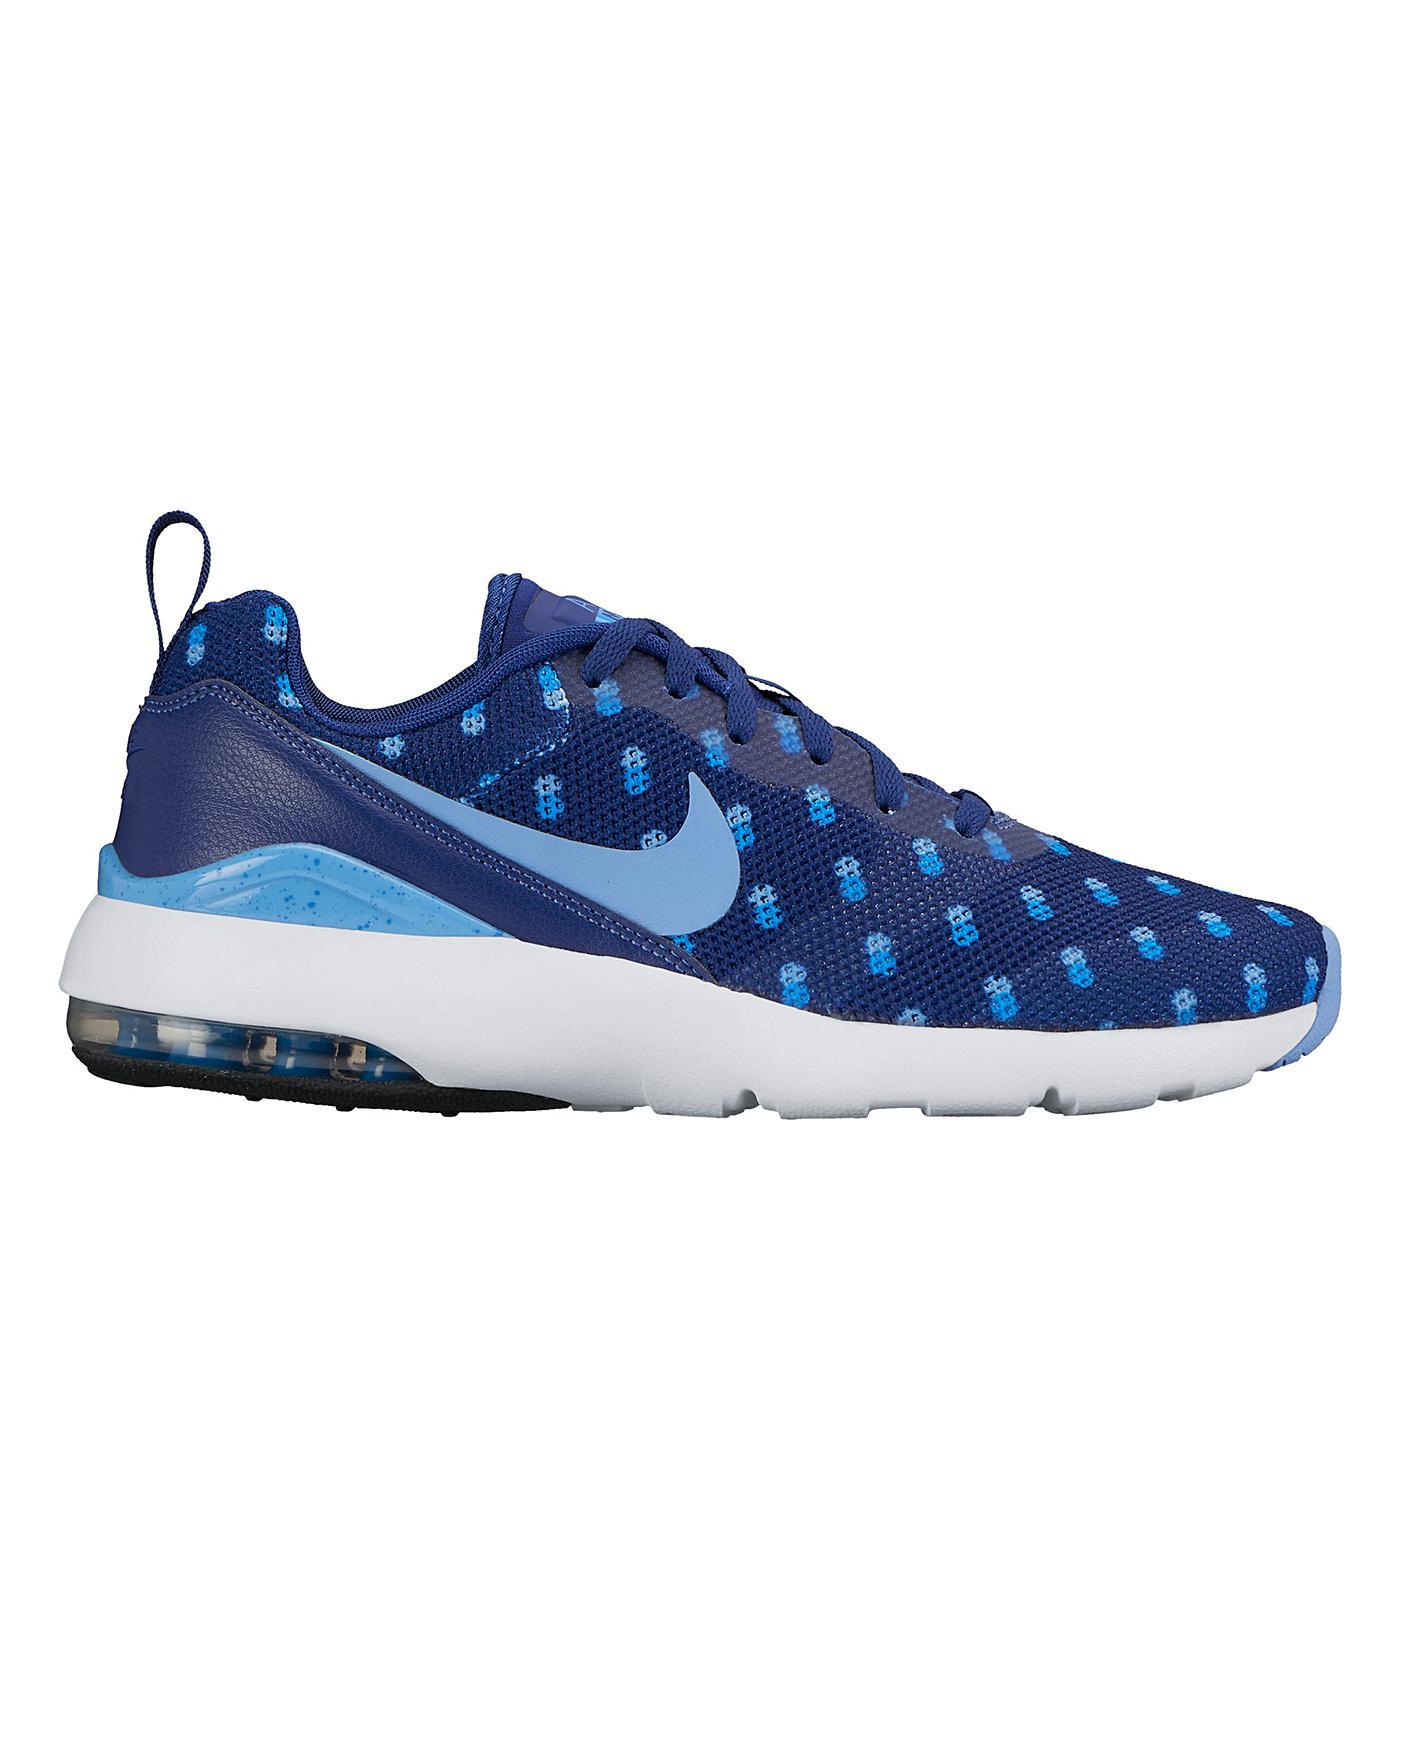 hot sale online 85ddf 2a9a9 Nike Air Max Siren Trainers